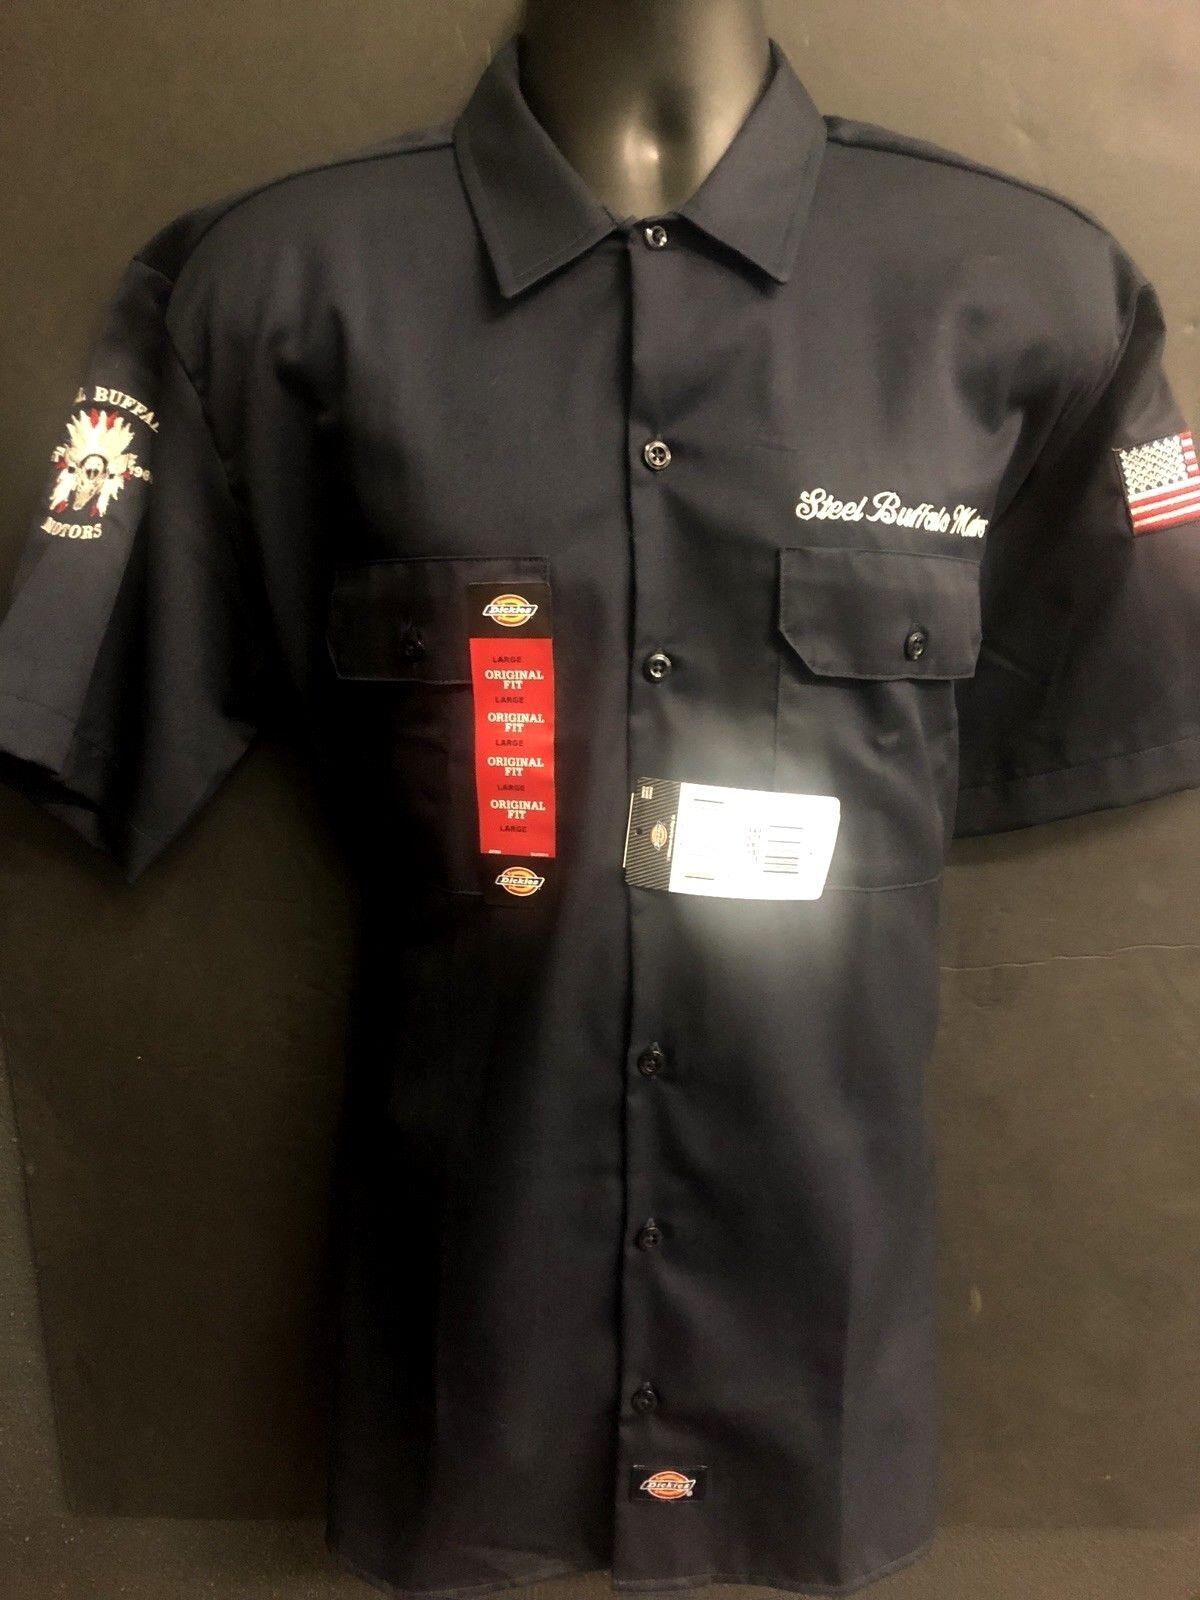 STEEL BUFFALO MOTORS EMBROIDERED 4 WAYS Men's Short Sleeve BIKER Work Shirt